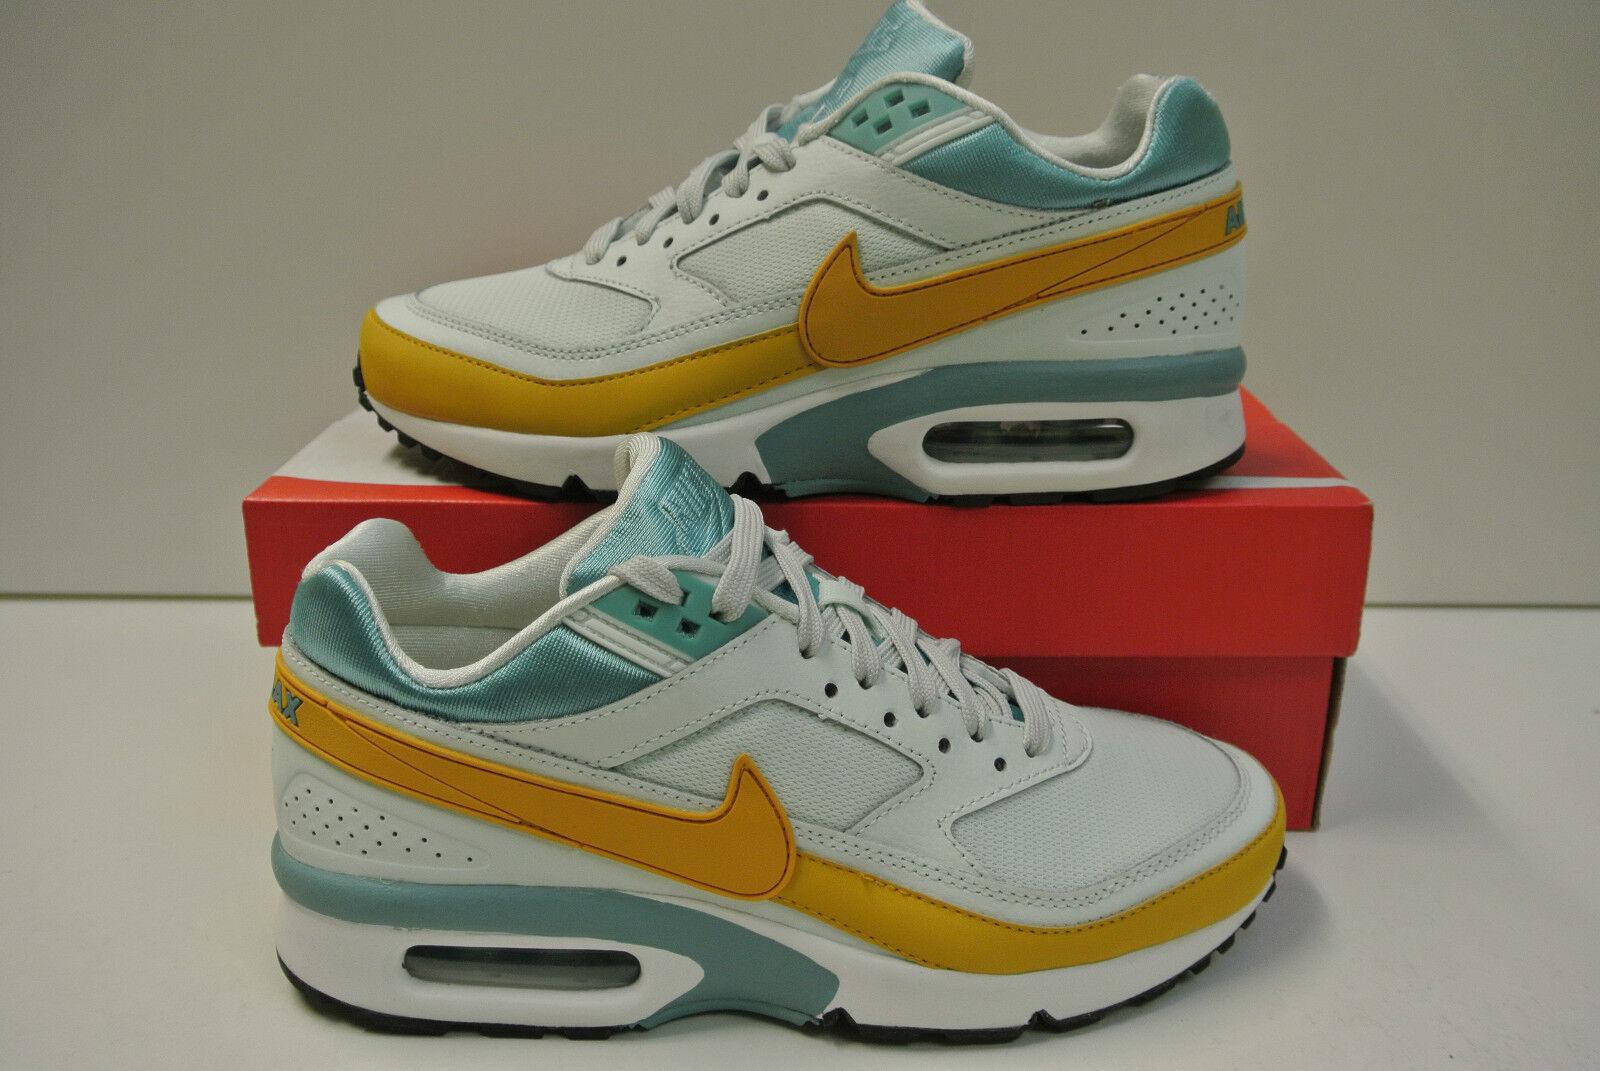 WMNS Nike Bir Max Classic BW   Gr. wählbar Neu & OVP 821956 300